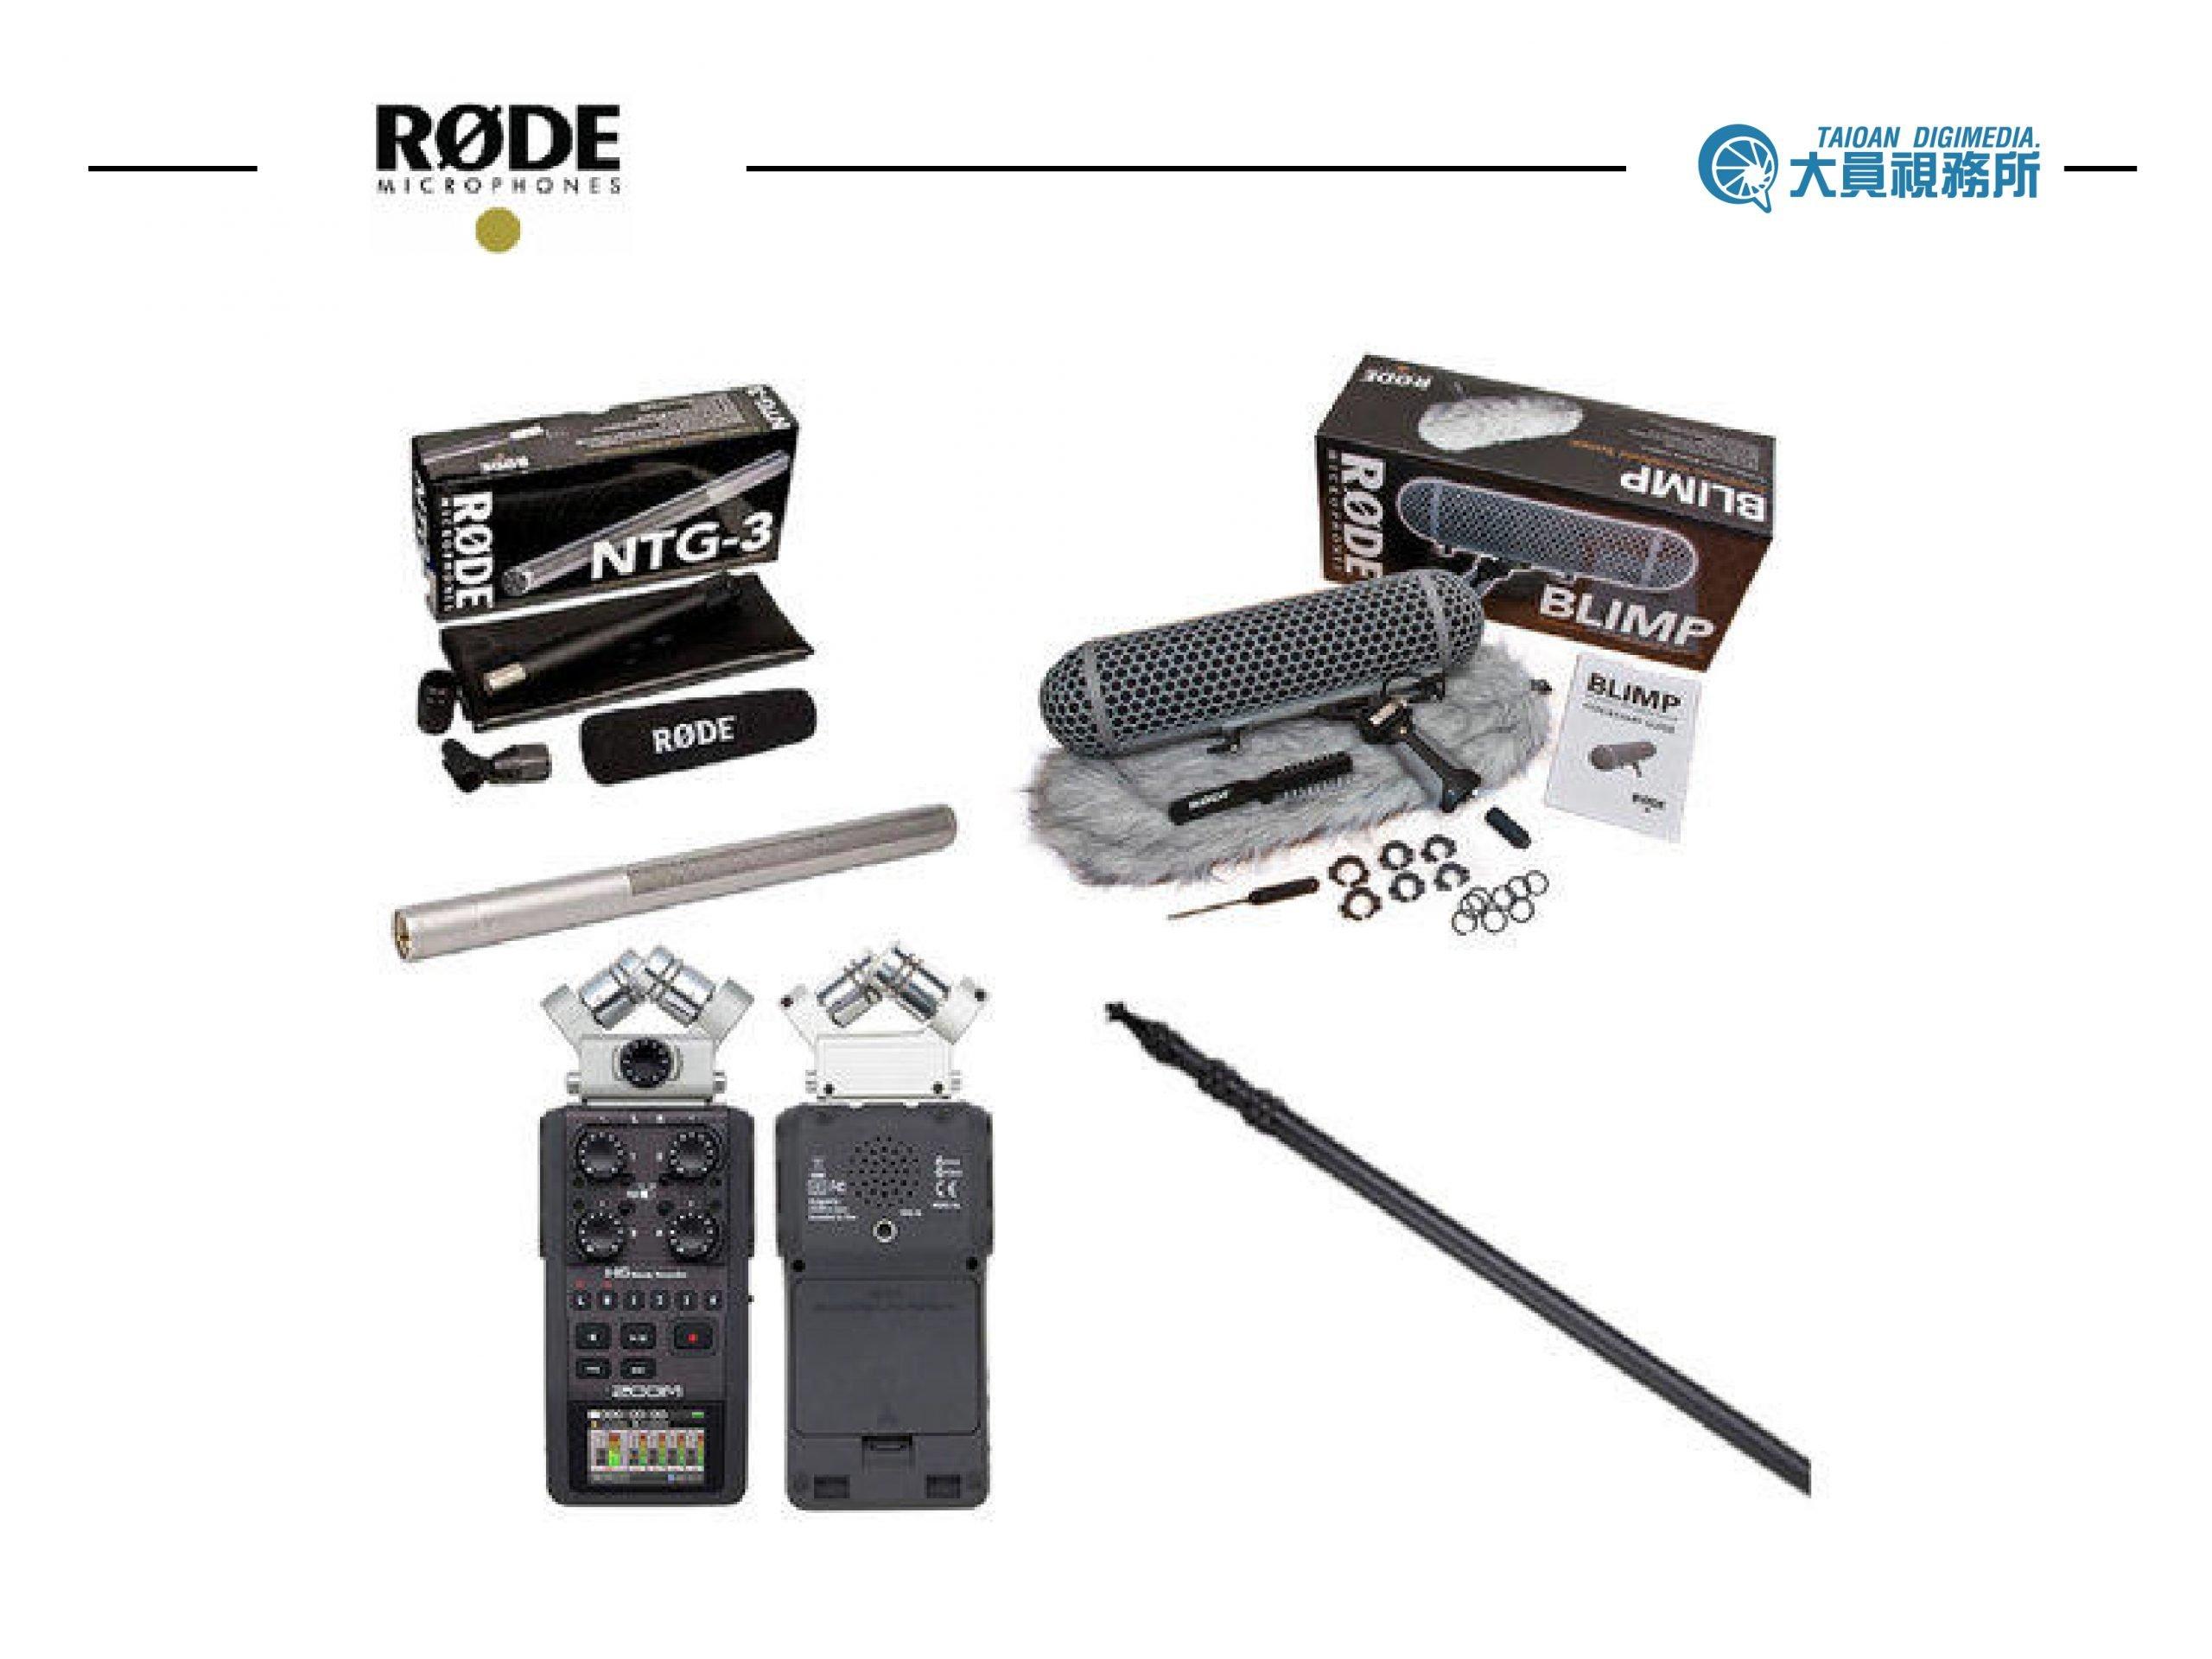 【RODE】錄音組合 NTG-3+BLIMP飛船組+H6+Boom桿